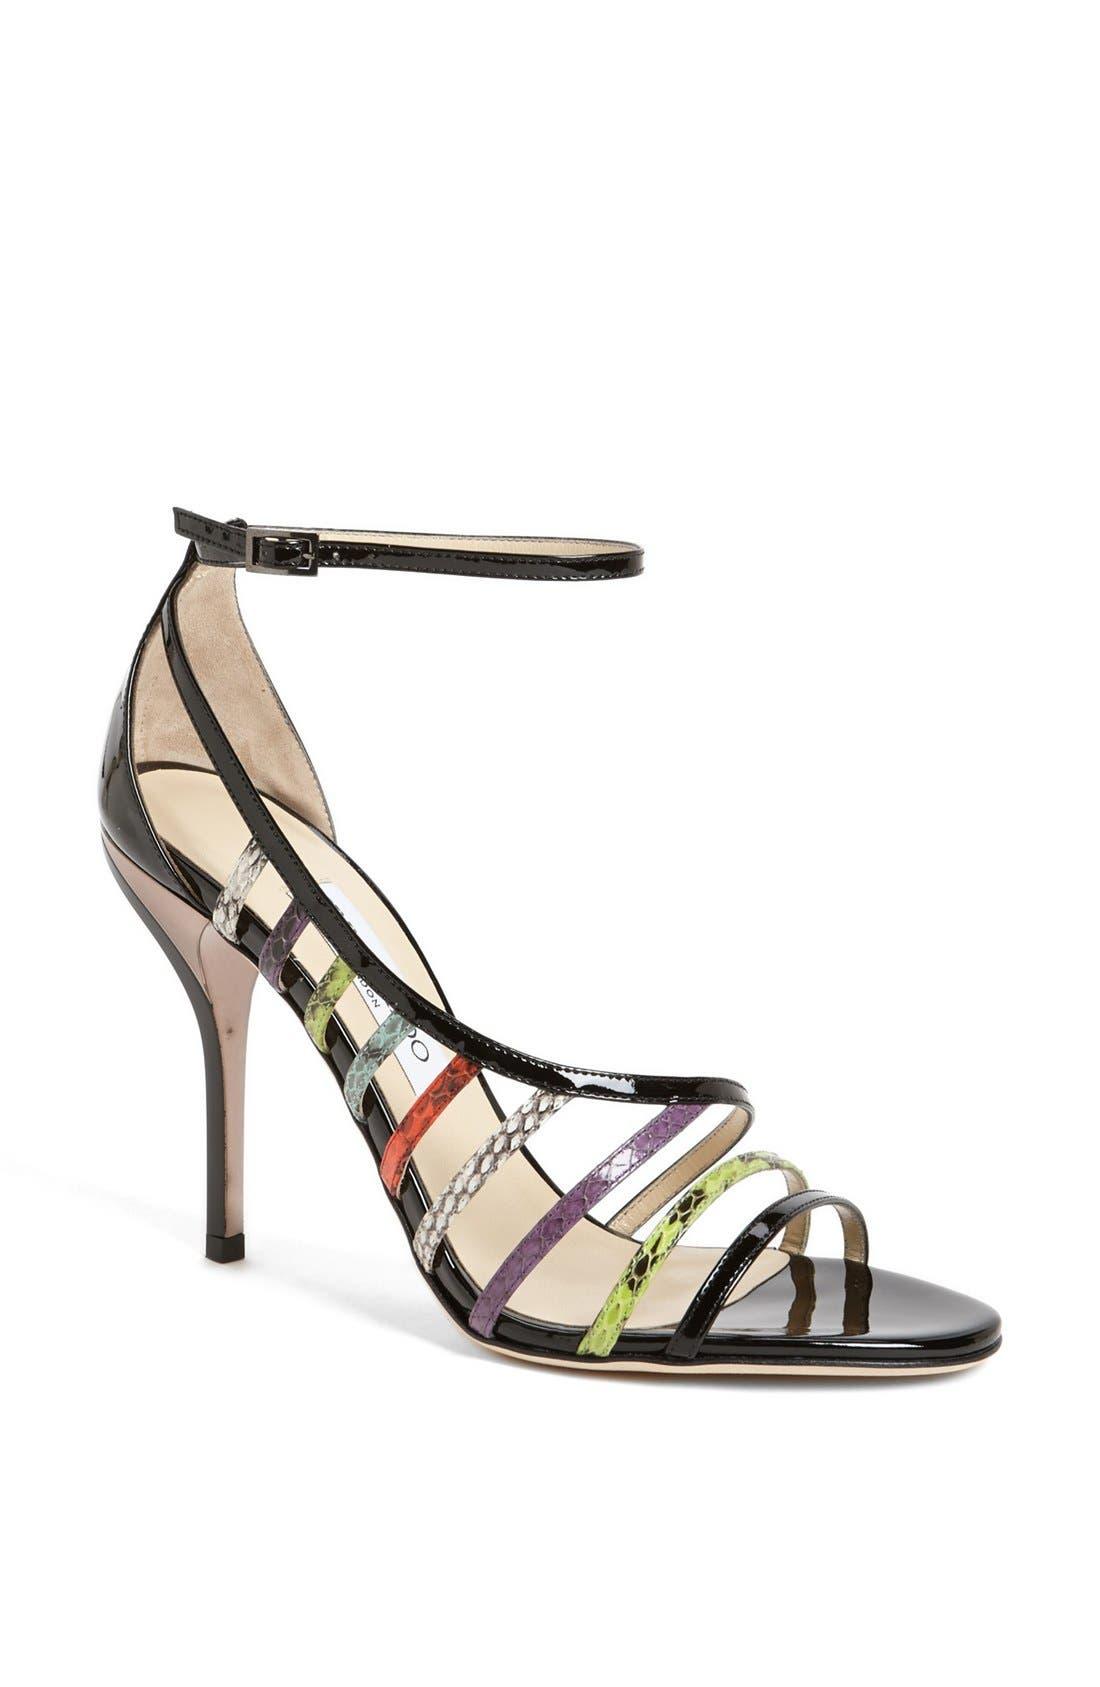 Alternate Image 1 Selected - Jimmy Choo 'Vuka' Ankle Strap Sandal